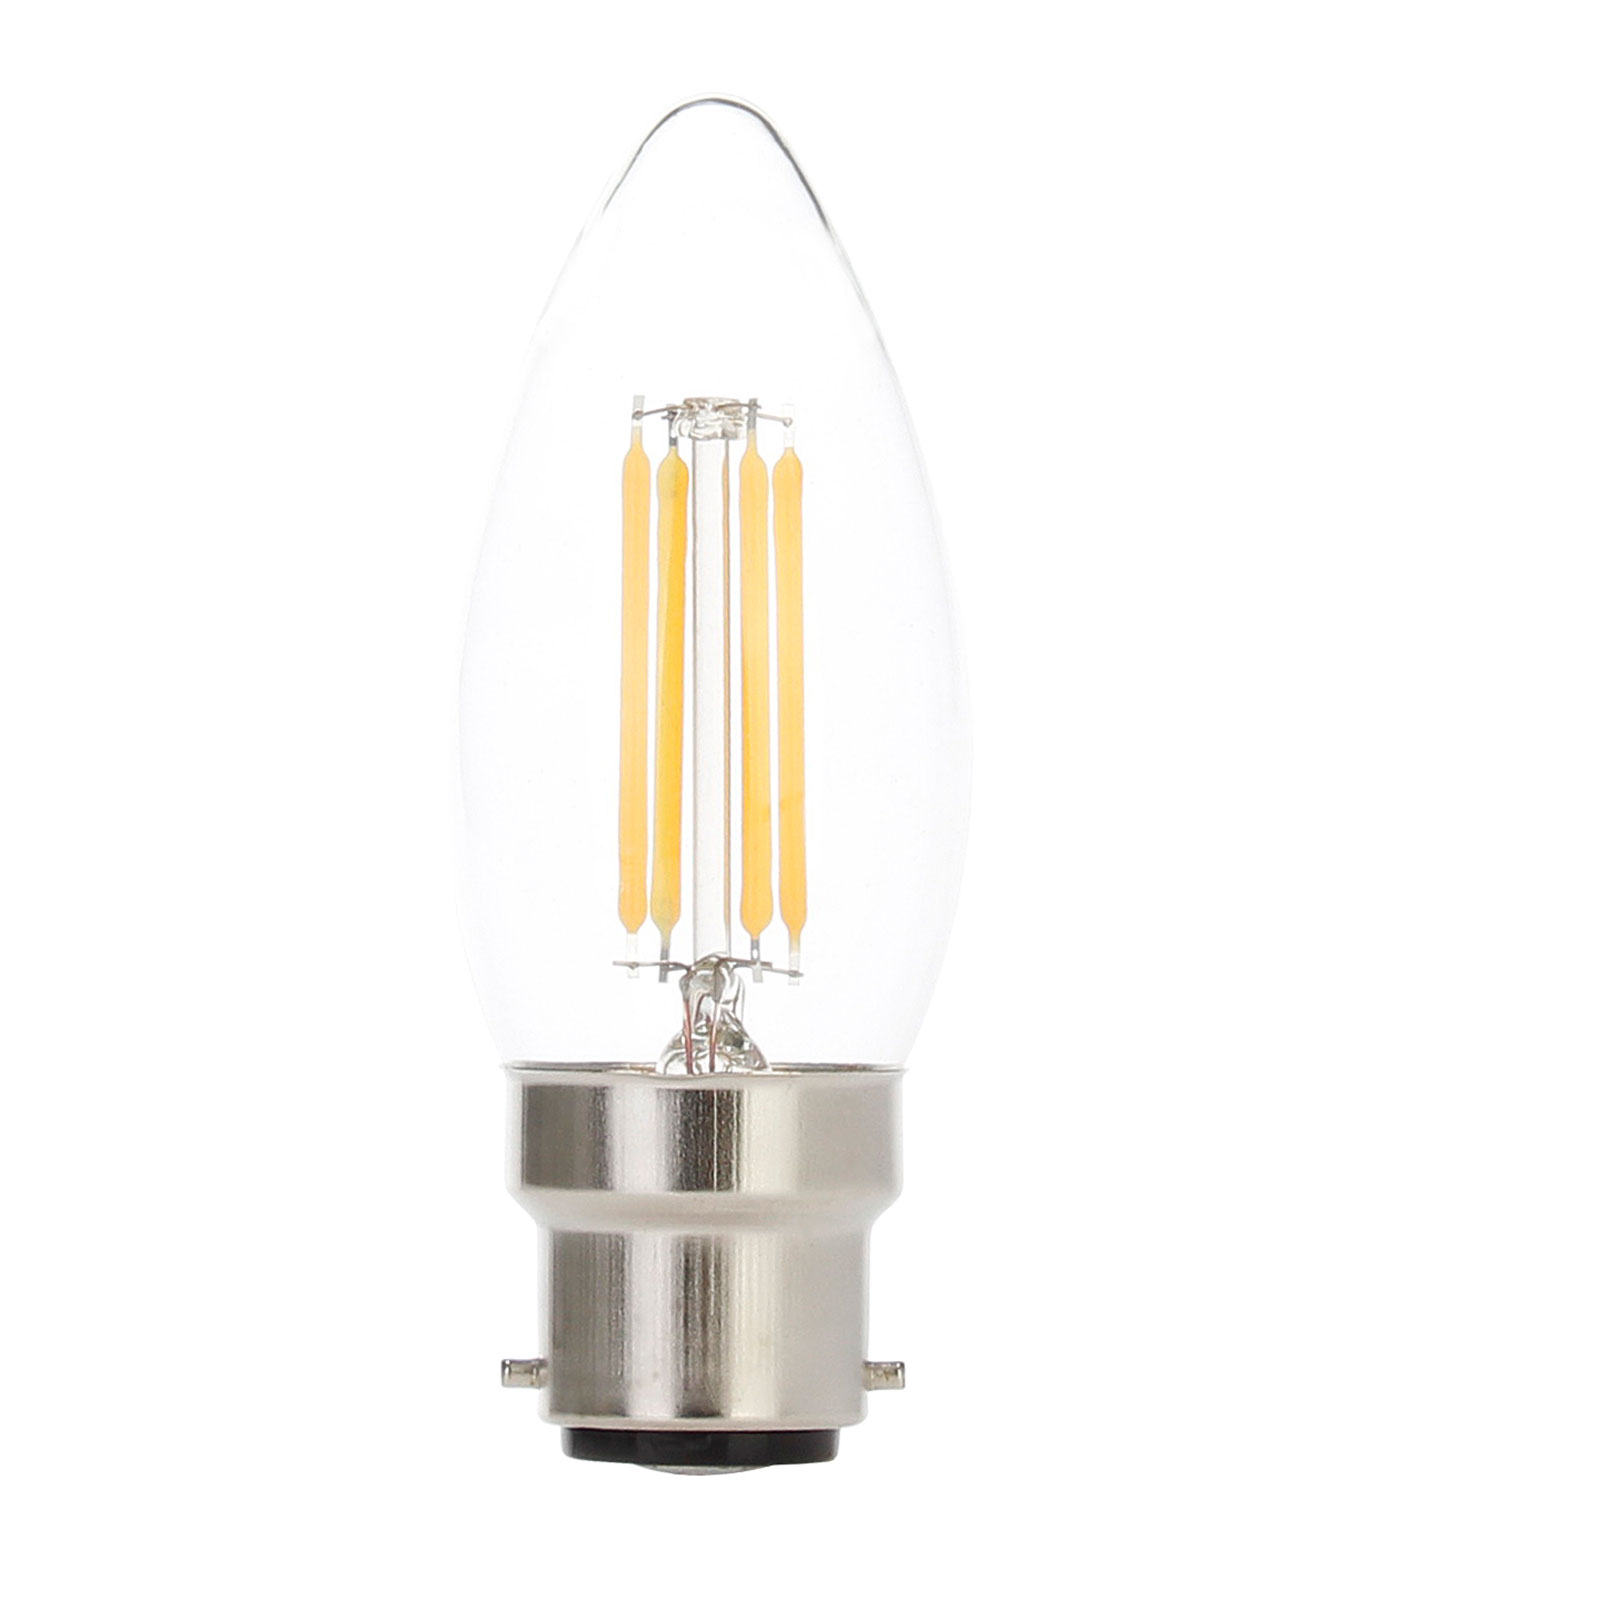 DEL Filament Edison Ampoules E27 B22 E14 Lampe ST64 Tip Bougie Globe Flamme Lampe